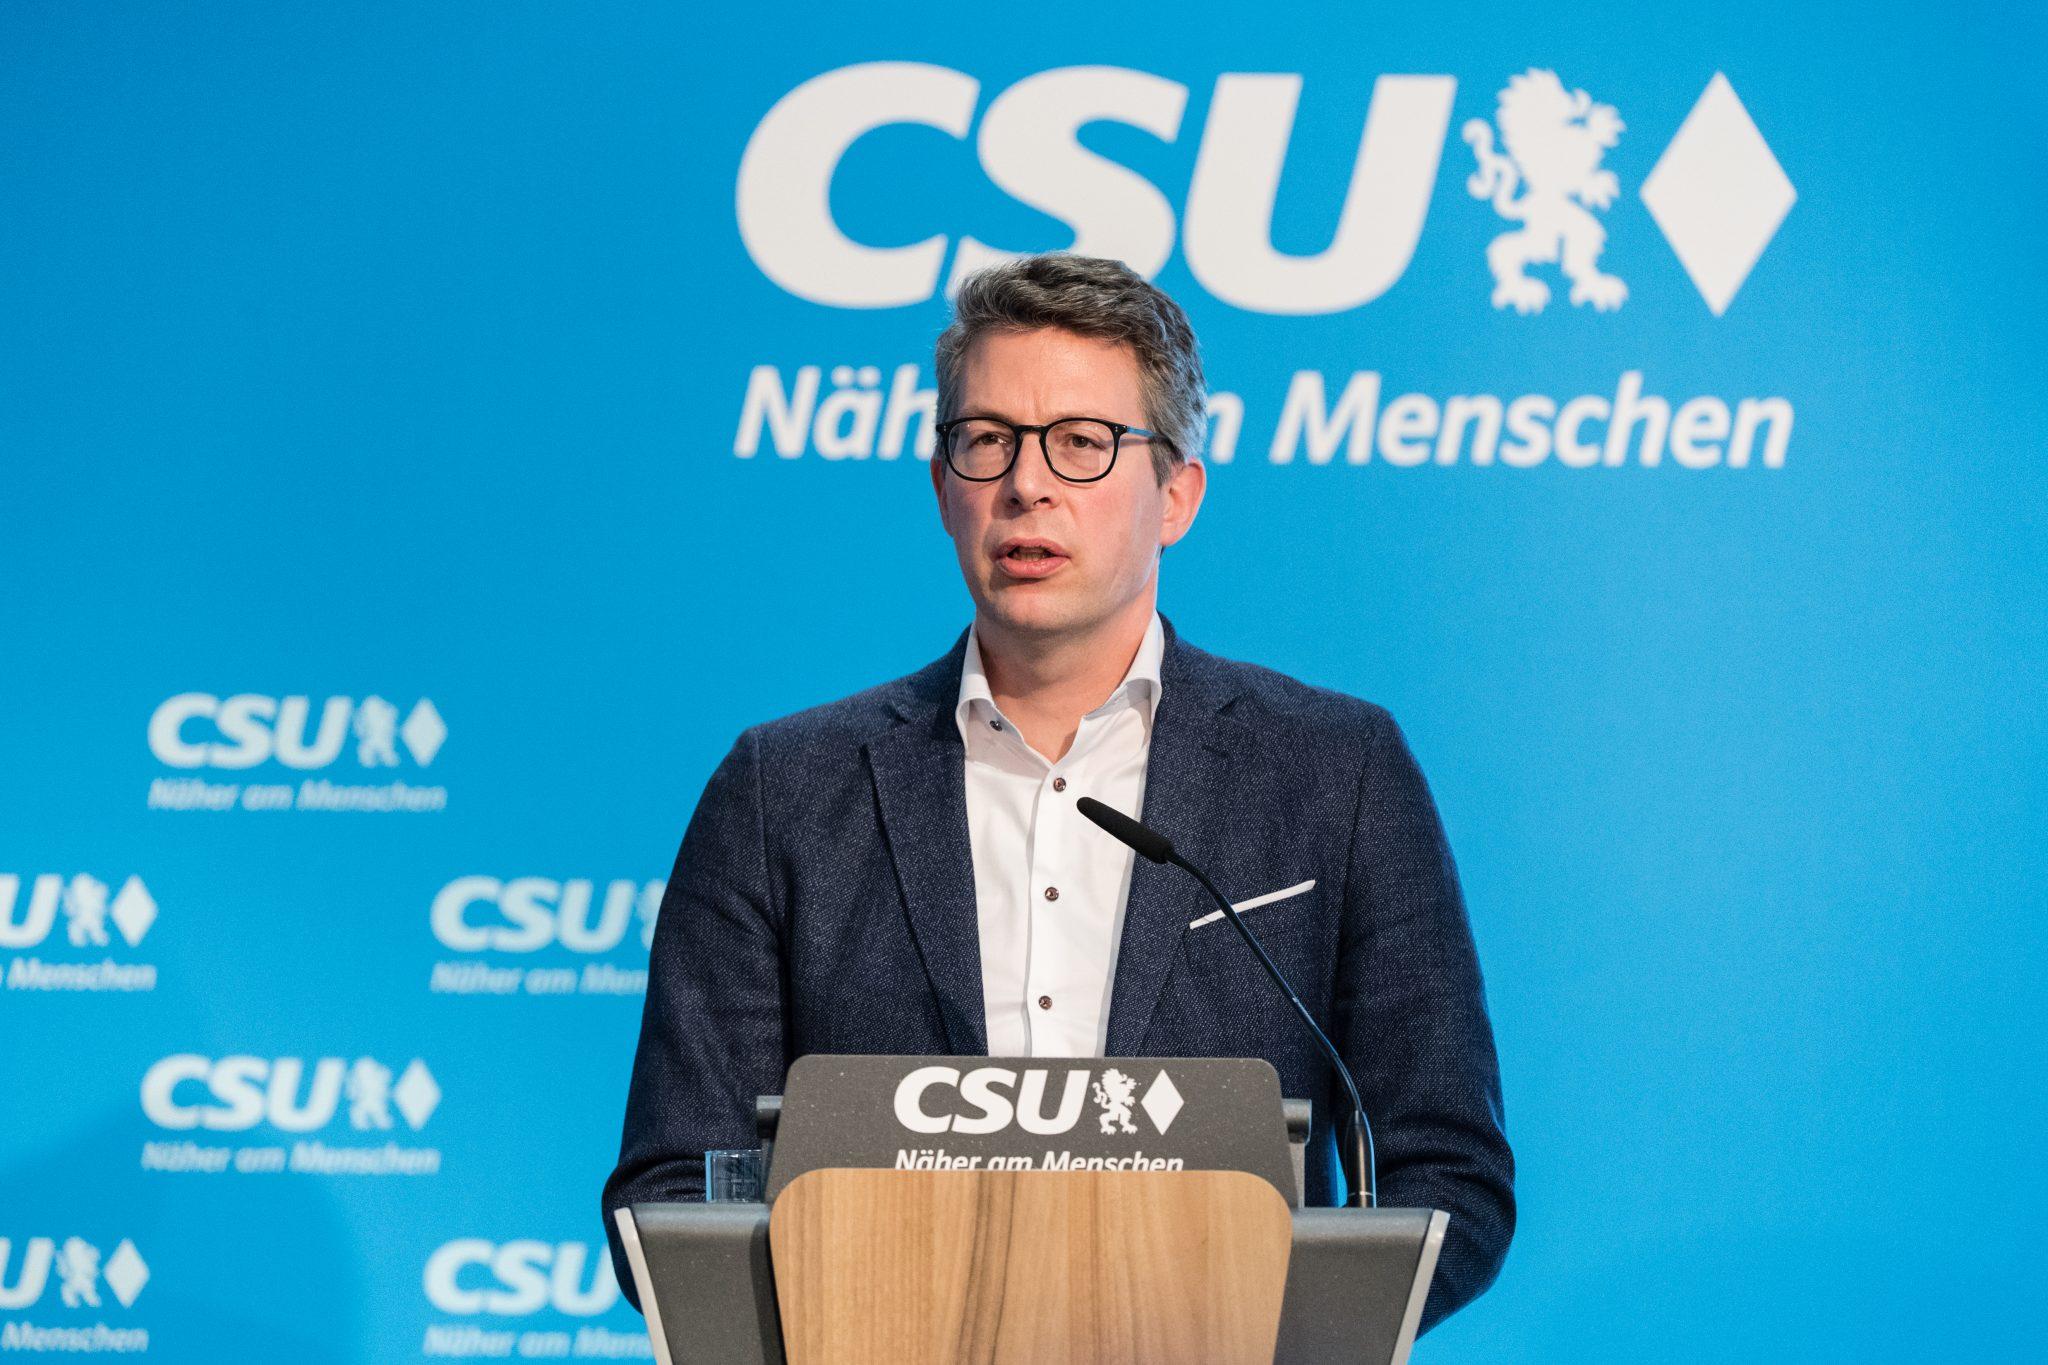 Markus Blume (CSU)